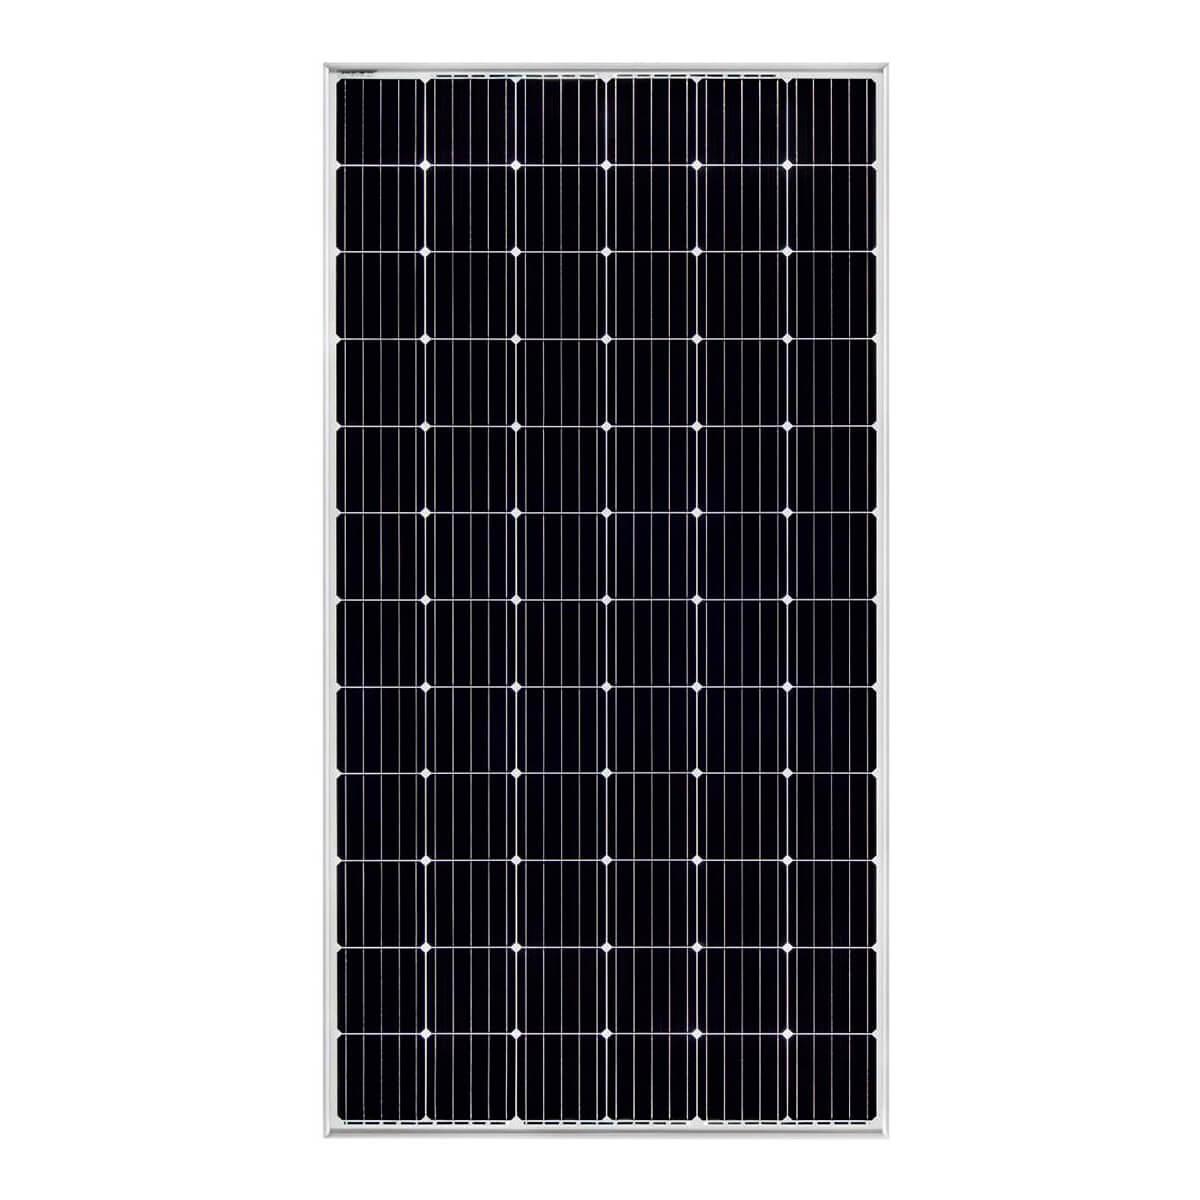 Odul solar 375W panel, odul solar 375Watt panel, Odul solar 375 W panel, odul solar 375 Watt panel, odul solar 375 Watt monokristal panel, Odul solar 375 W watt gunes paneli, odul solar 375 W watt monokristal gunes paneli, odul solar 375 W Watt fotovoltaik monokristal solar panel, odul solar 375W monokristal gunes enerjisi, odul solar OSMp72-375W panel, ÖDÜL SOLAR 375 WATT